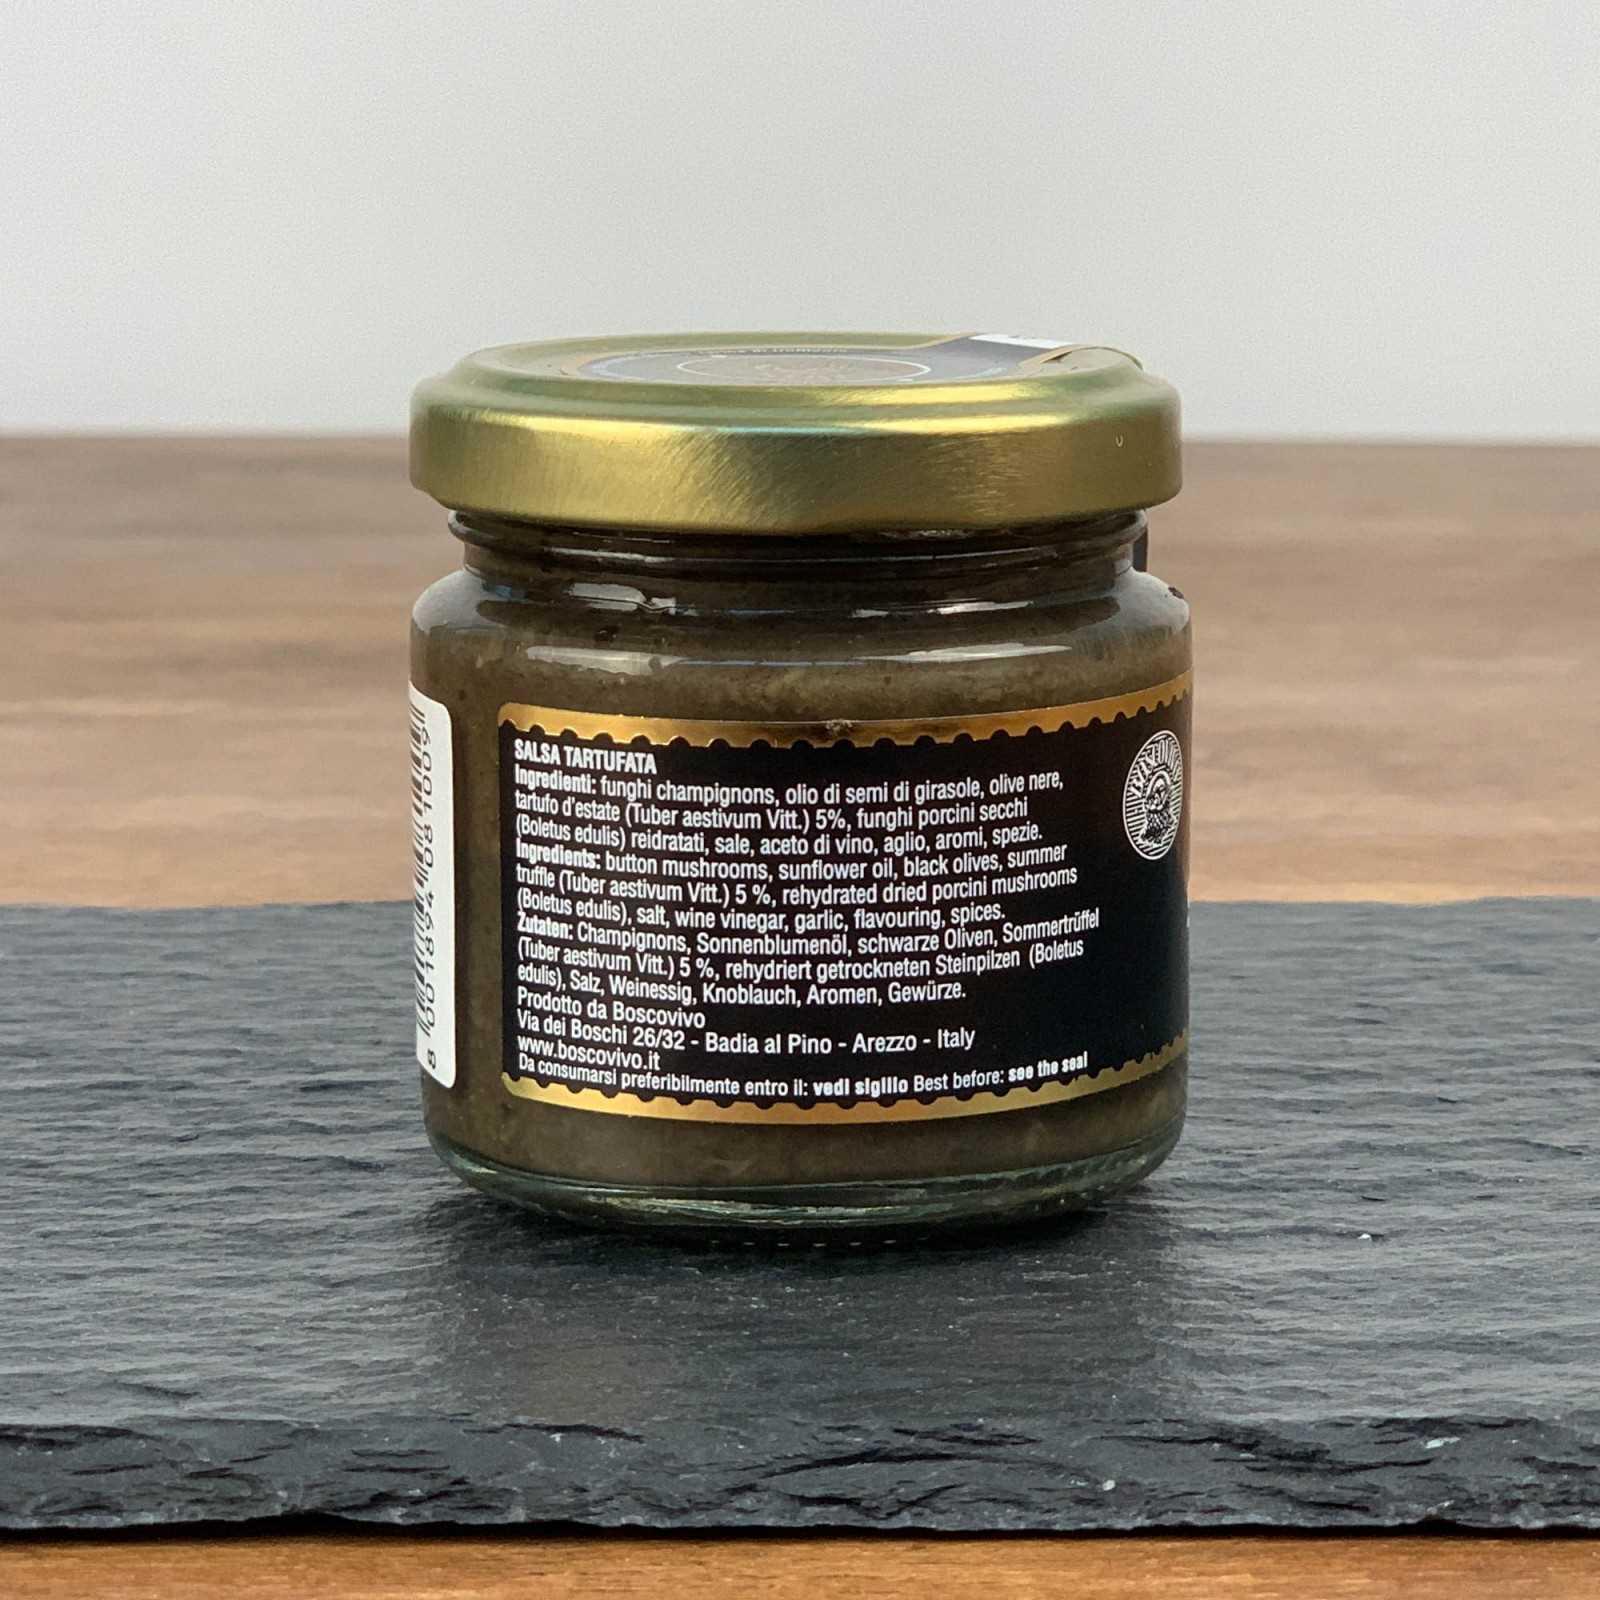 Black Summer Truffle Sauce - Tuber Aestivum Vitt. - 100% Italian.